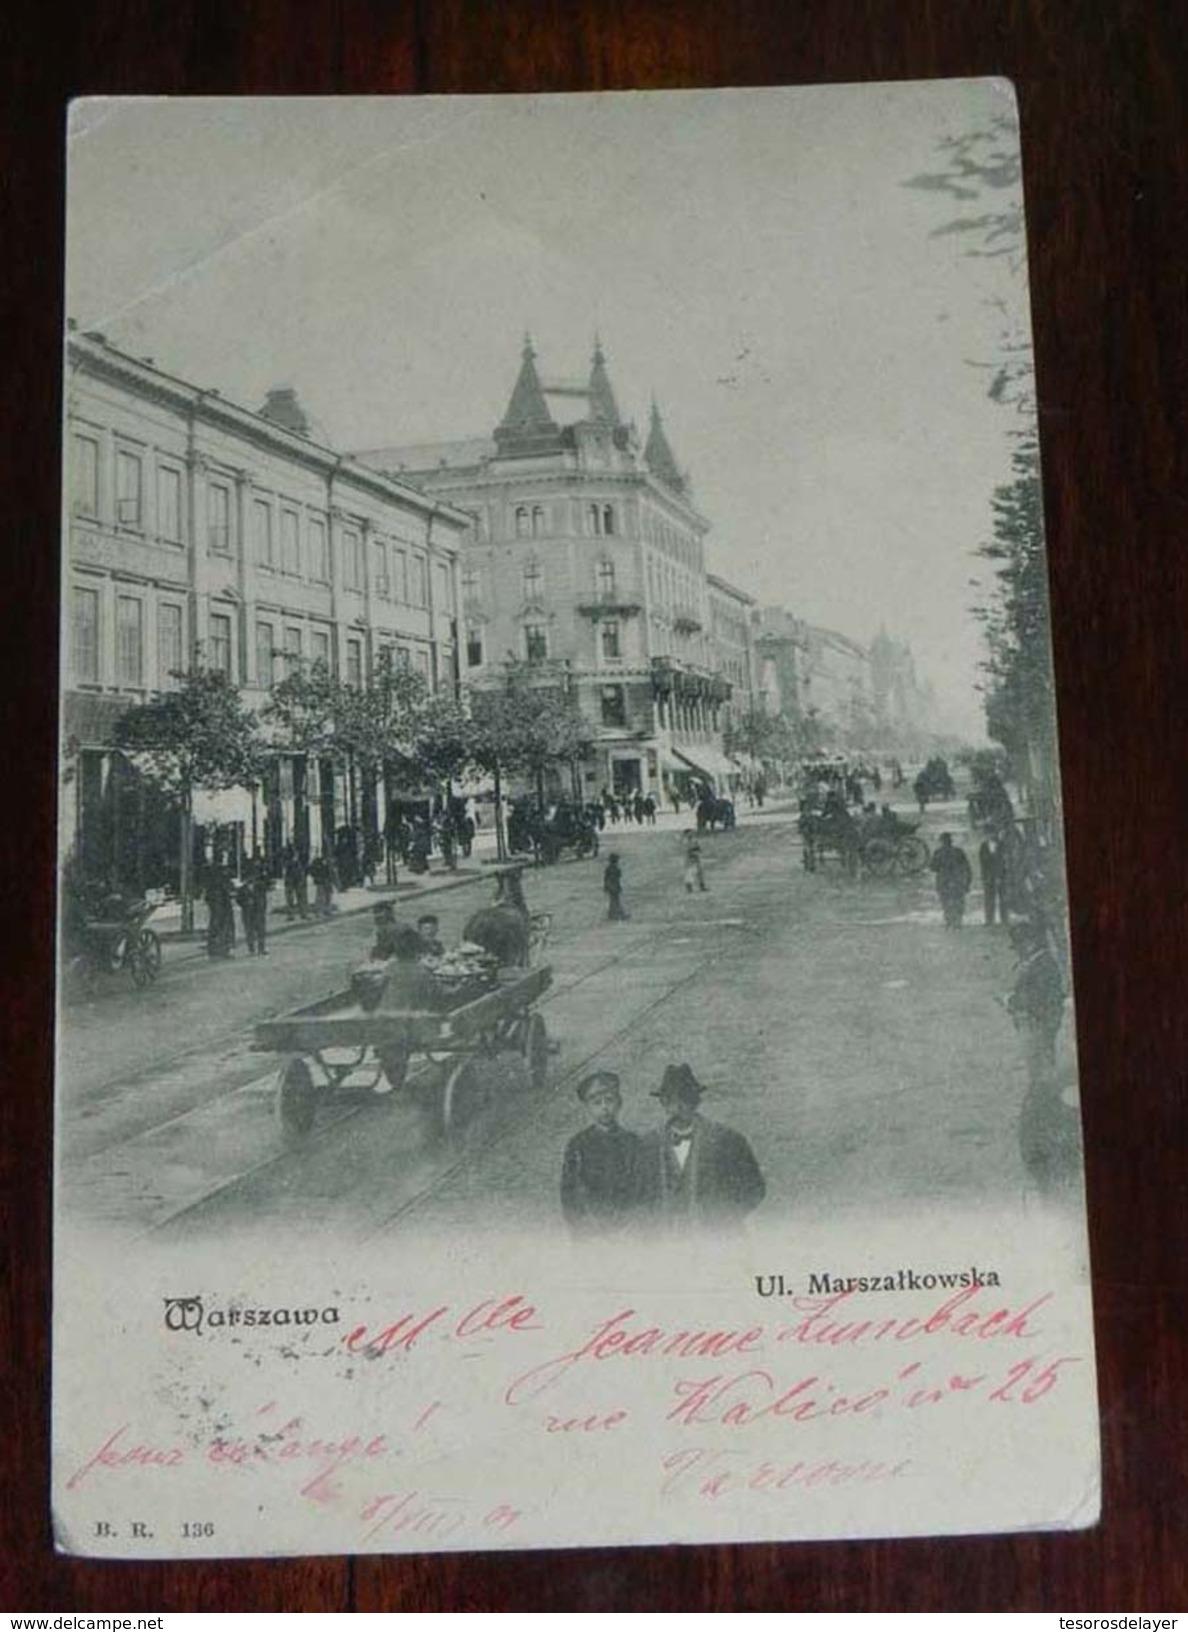 WARSZAWA. UL. MARSZALKOWSKA, B.R. 136 - Polonia